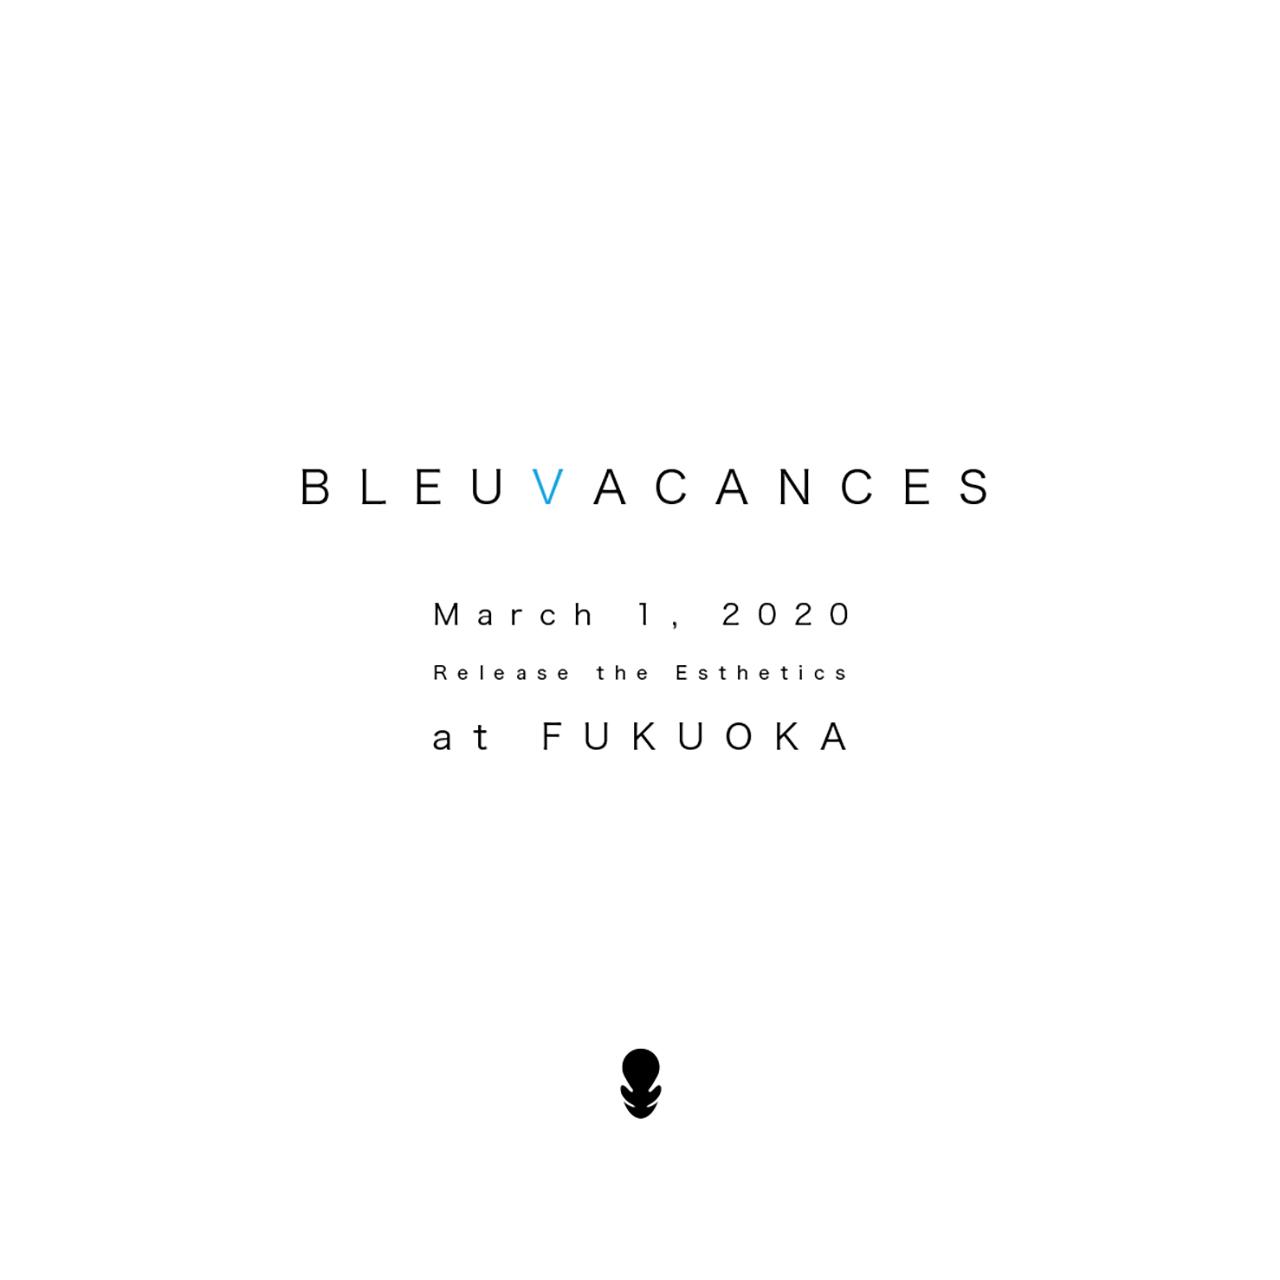 BLEUVACANCES-2